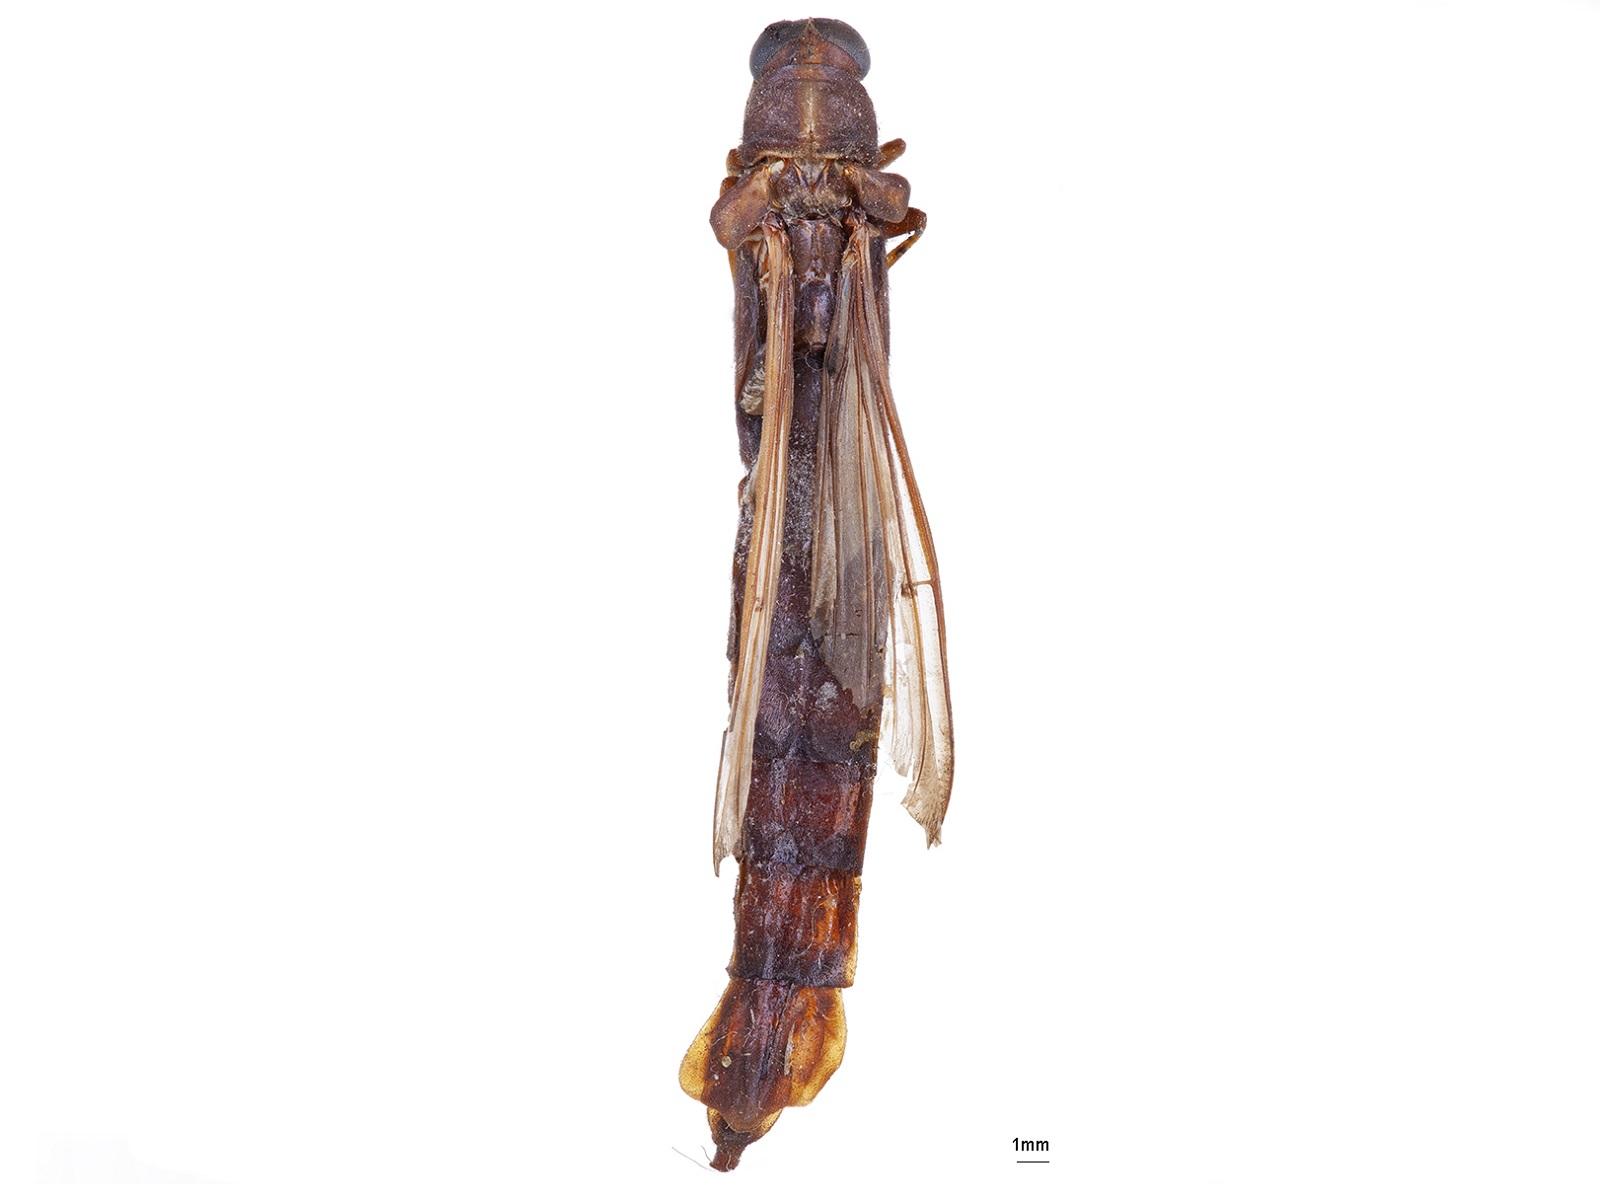 Atractocerus brasiliensis Lepeletier & Audinet-Serville, 1825